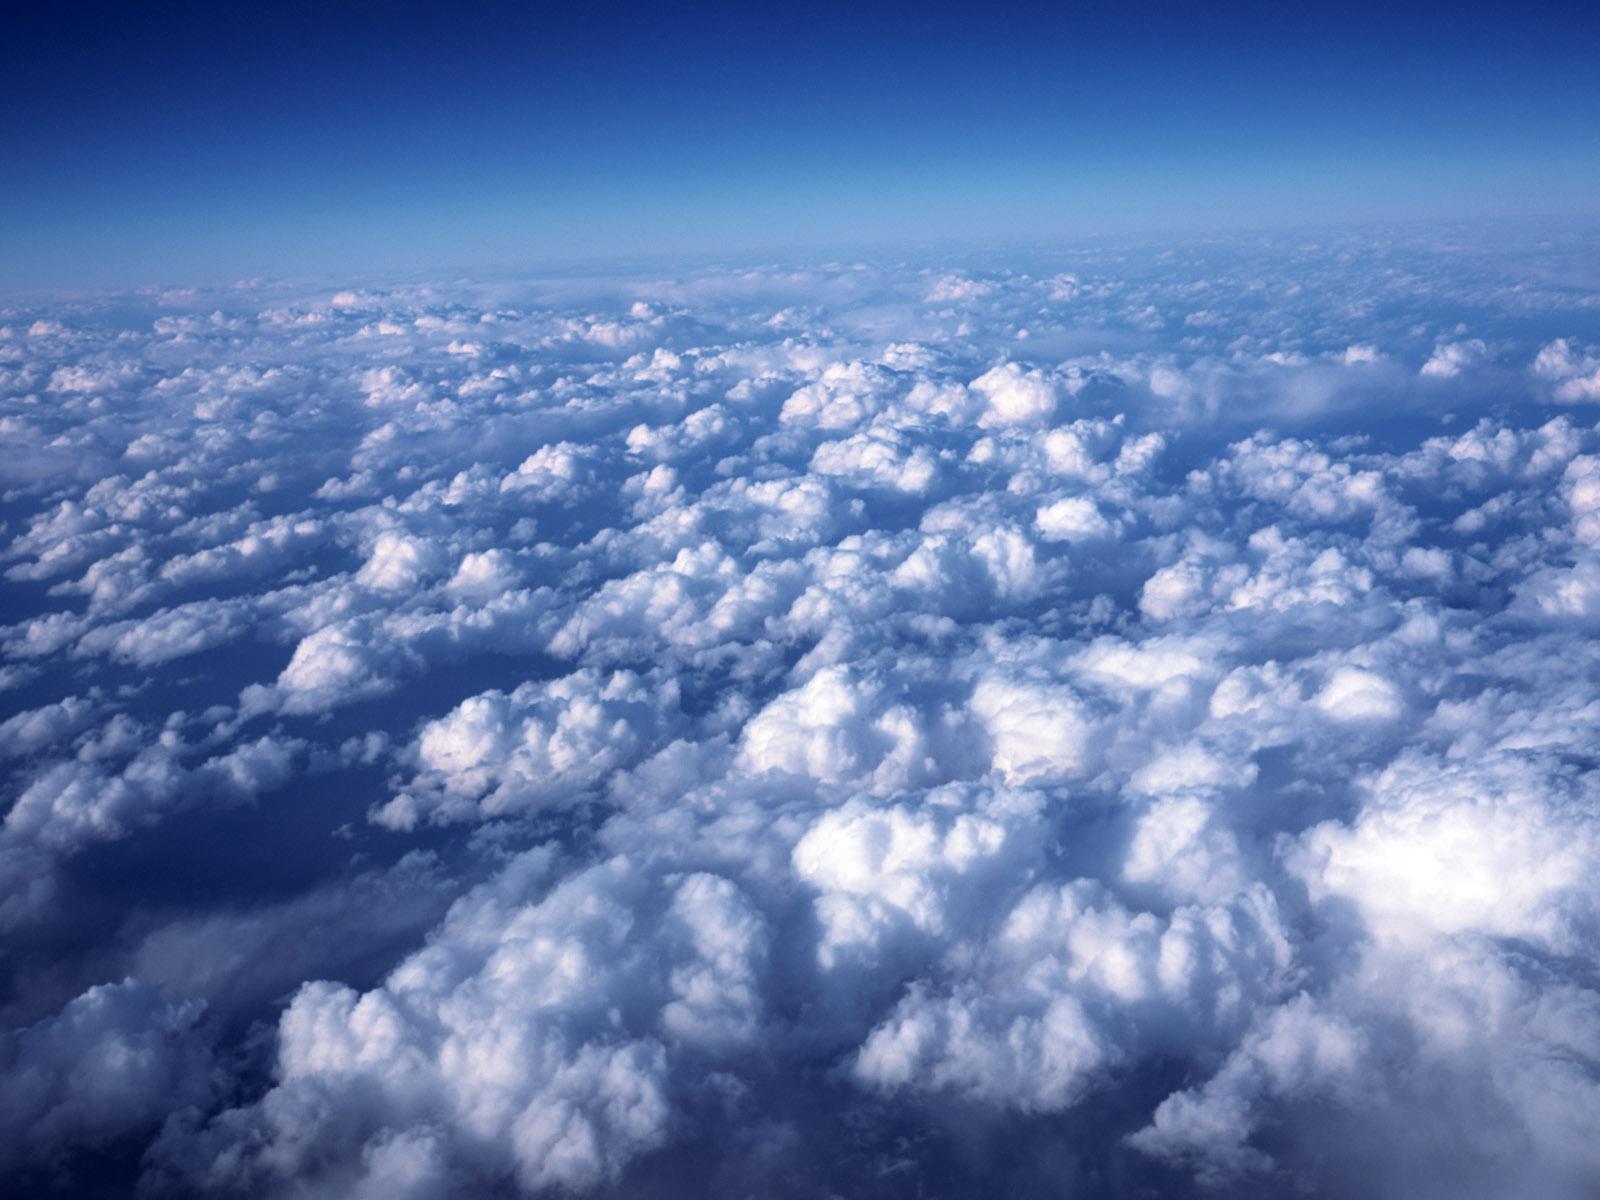 Cloud Wallpapers 1600x1200